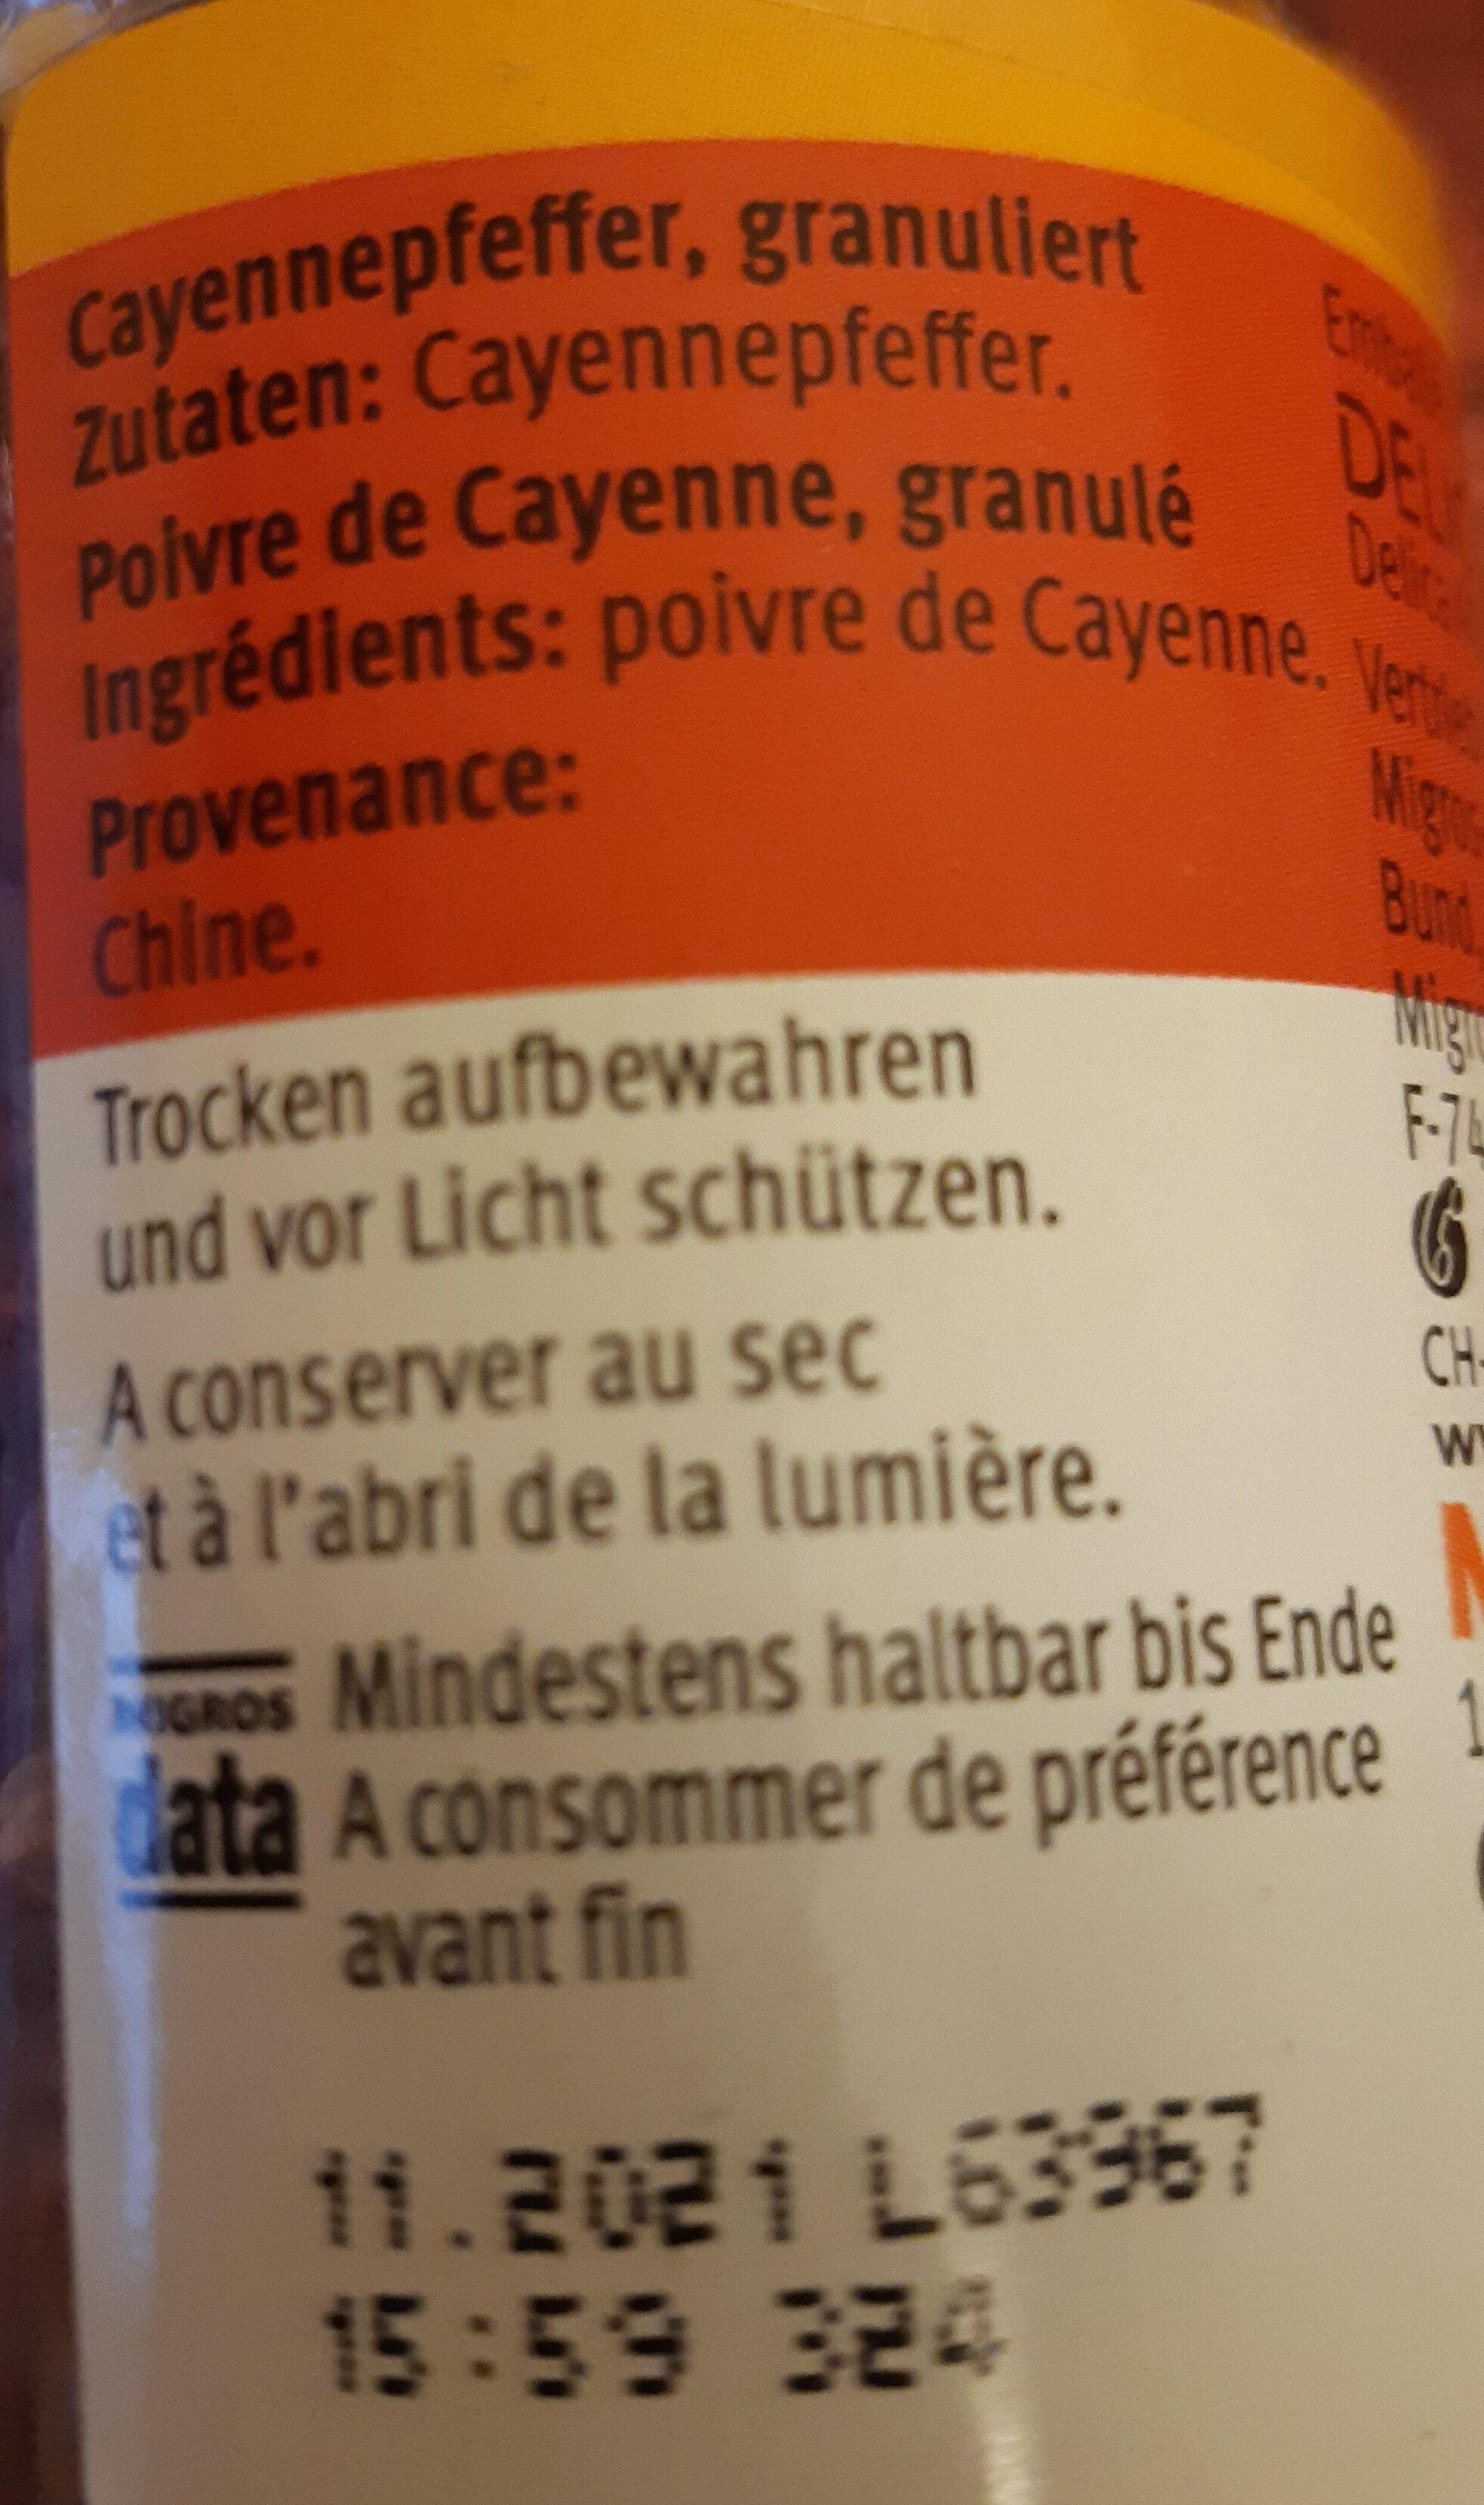 Cayennepfeffer - Ingredienti - fr